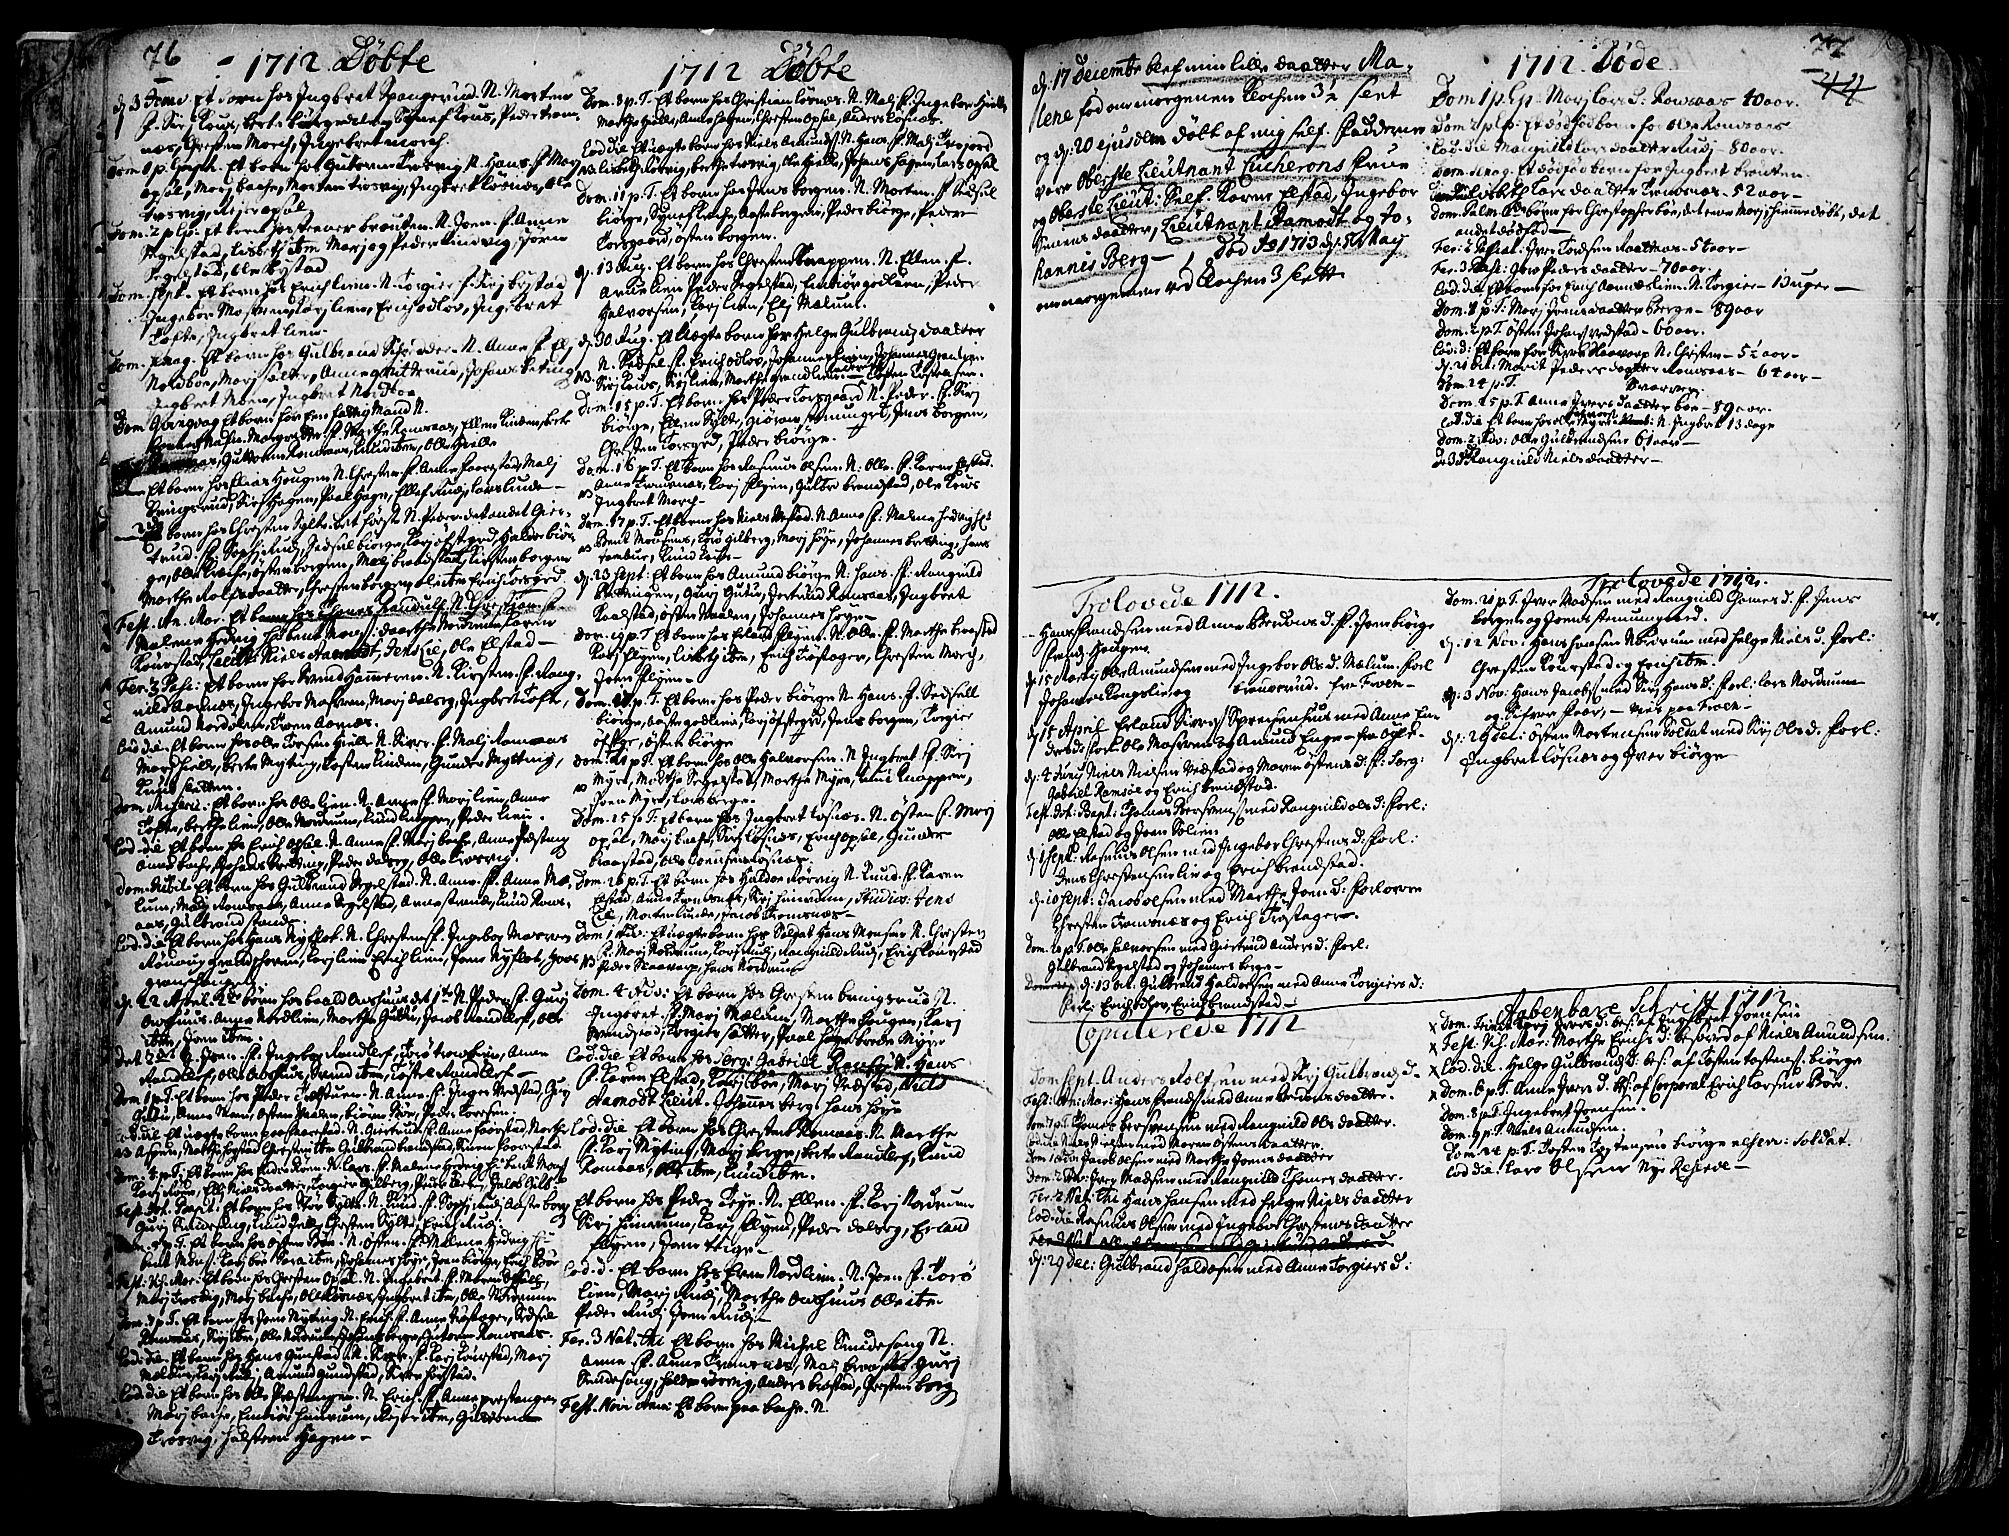 SAH, Ringebu prestekontor, Ministerialbok nr. 1, 1696-1733, s. 76-77